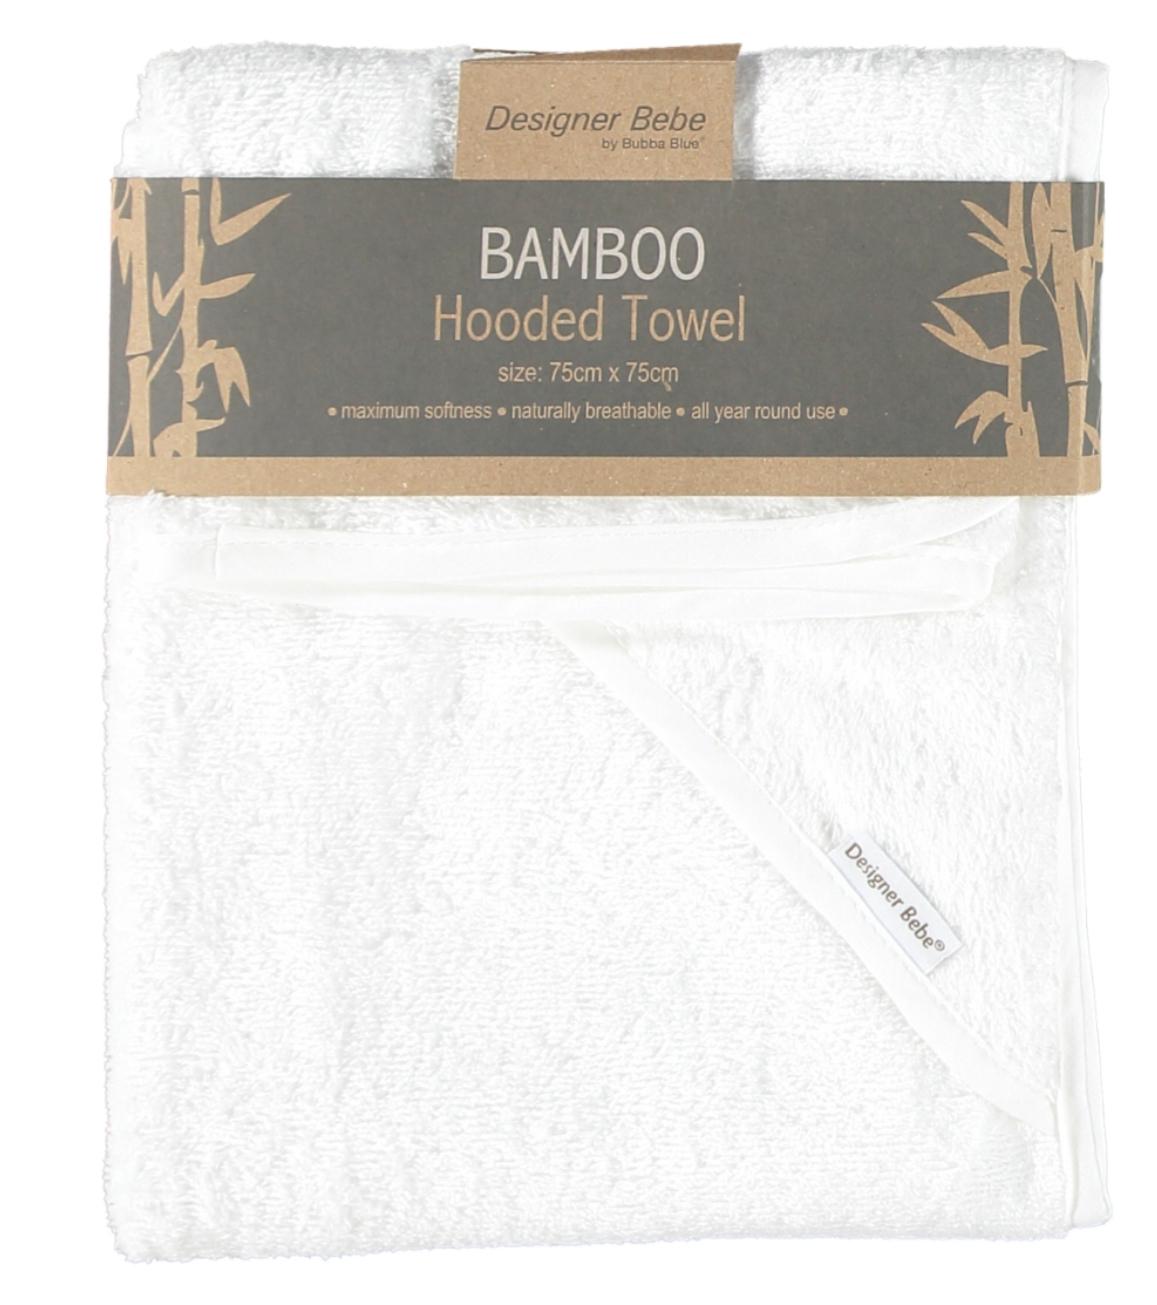 BABY HOODED TOWEL BAMBOO